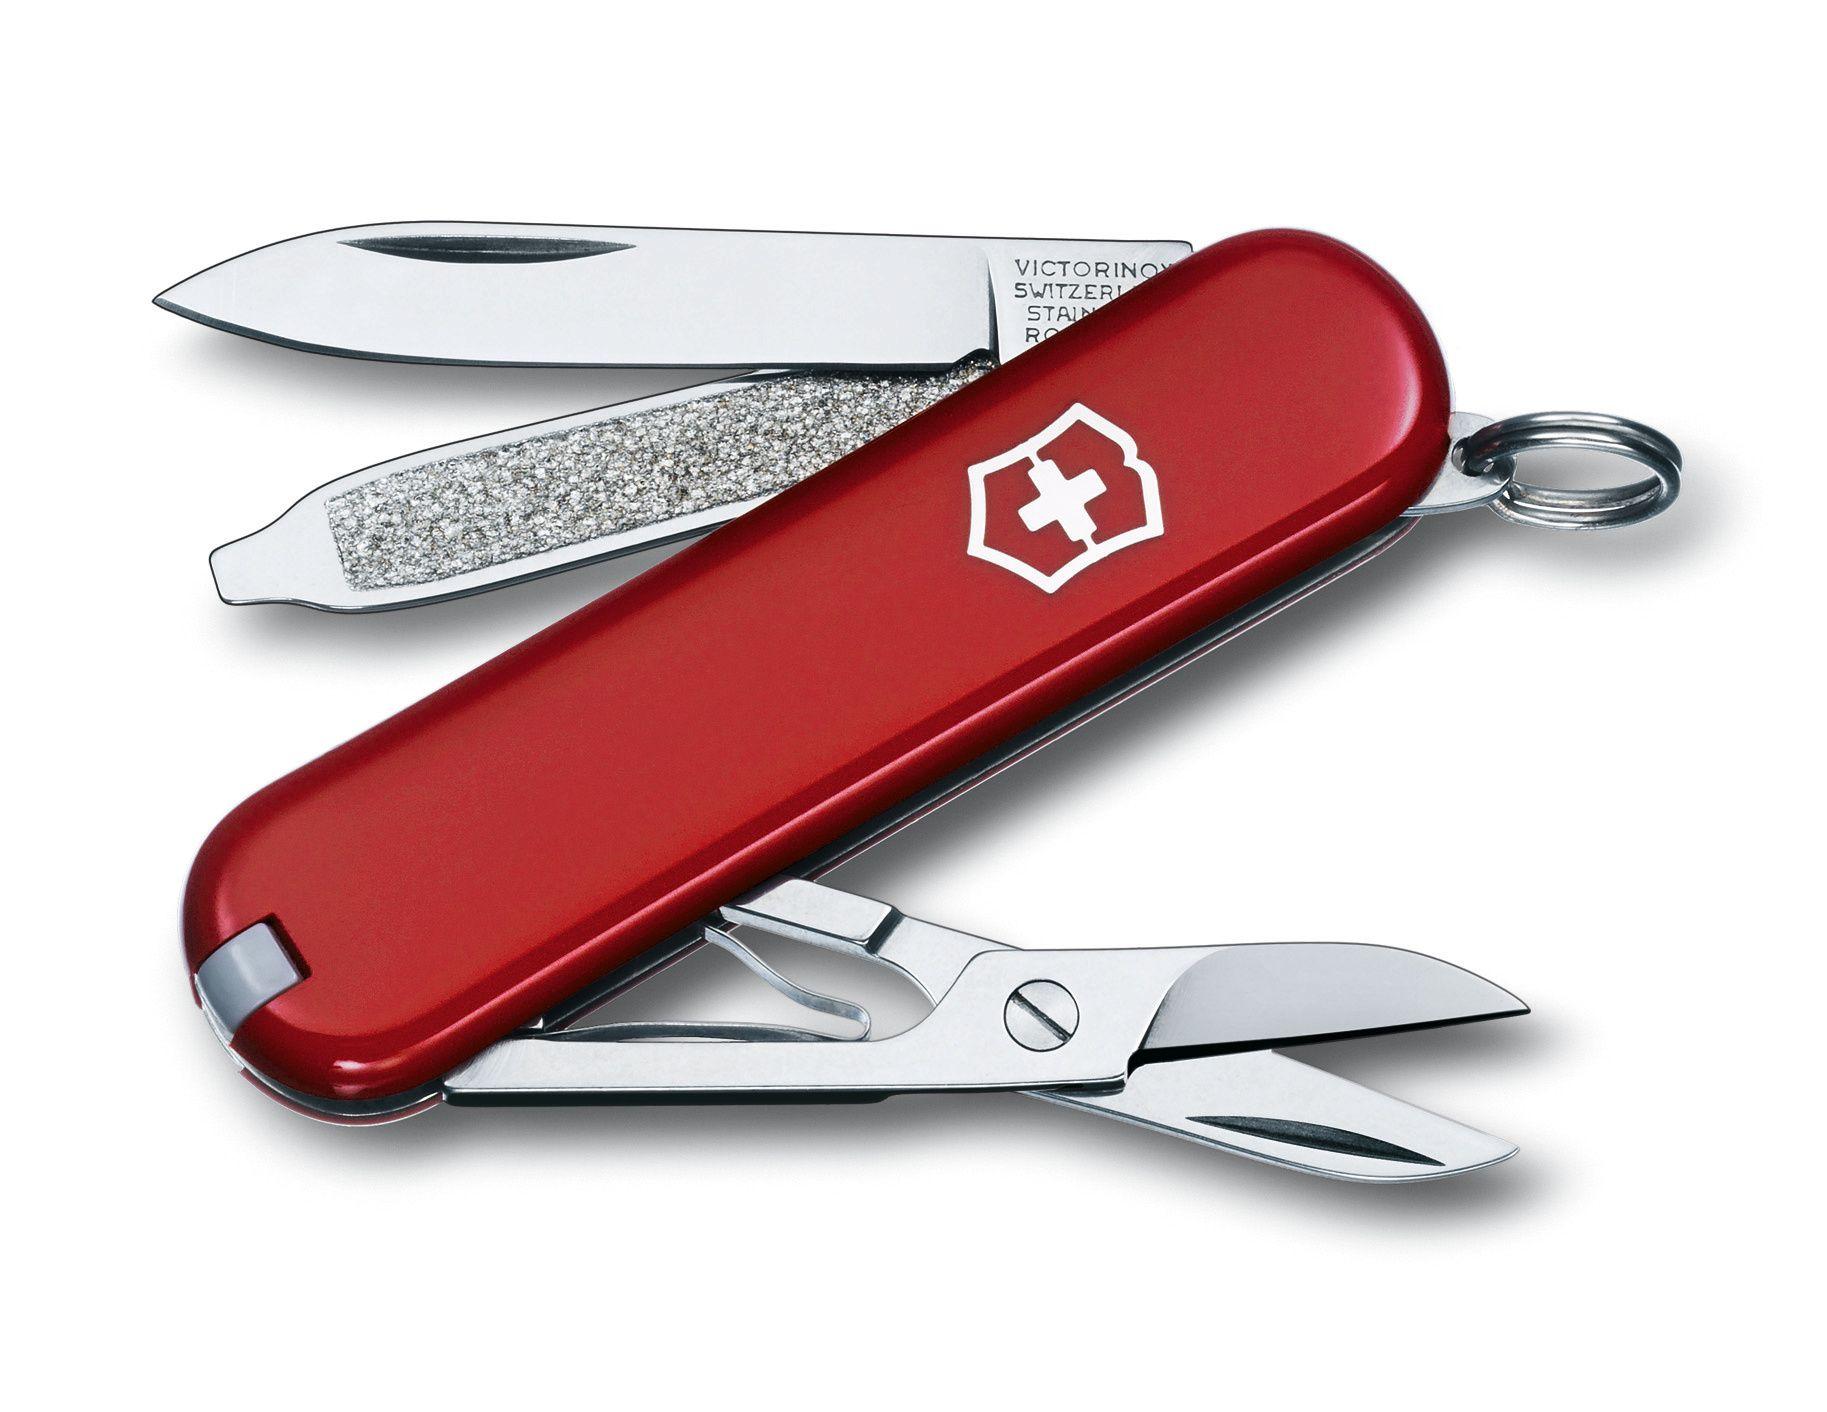 VICTORINOX Classic Swiss Army Knife